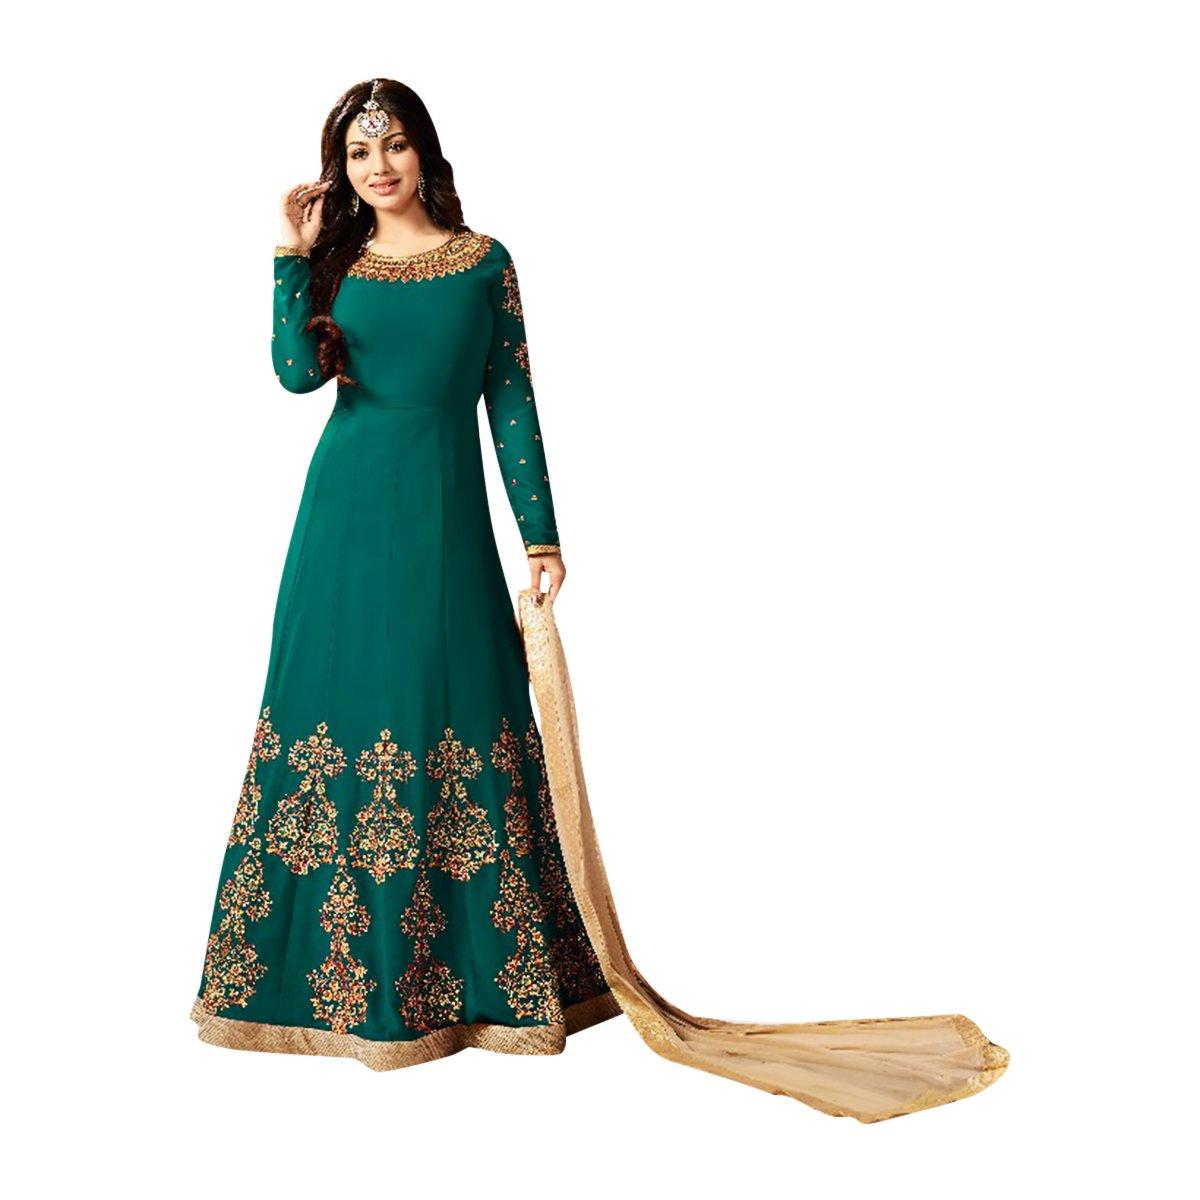 Black Friday Sale Bollywood Designer Wedding Wear Salwar Suit Lehenga Dress Kaftan Women MuslimEthnic Traditional 592 (4, Green) by ETHNIC EMPORIUM (Image #1)